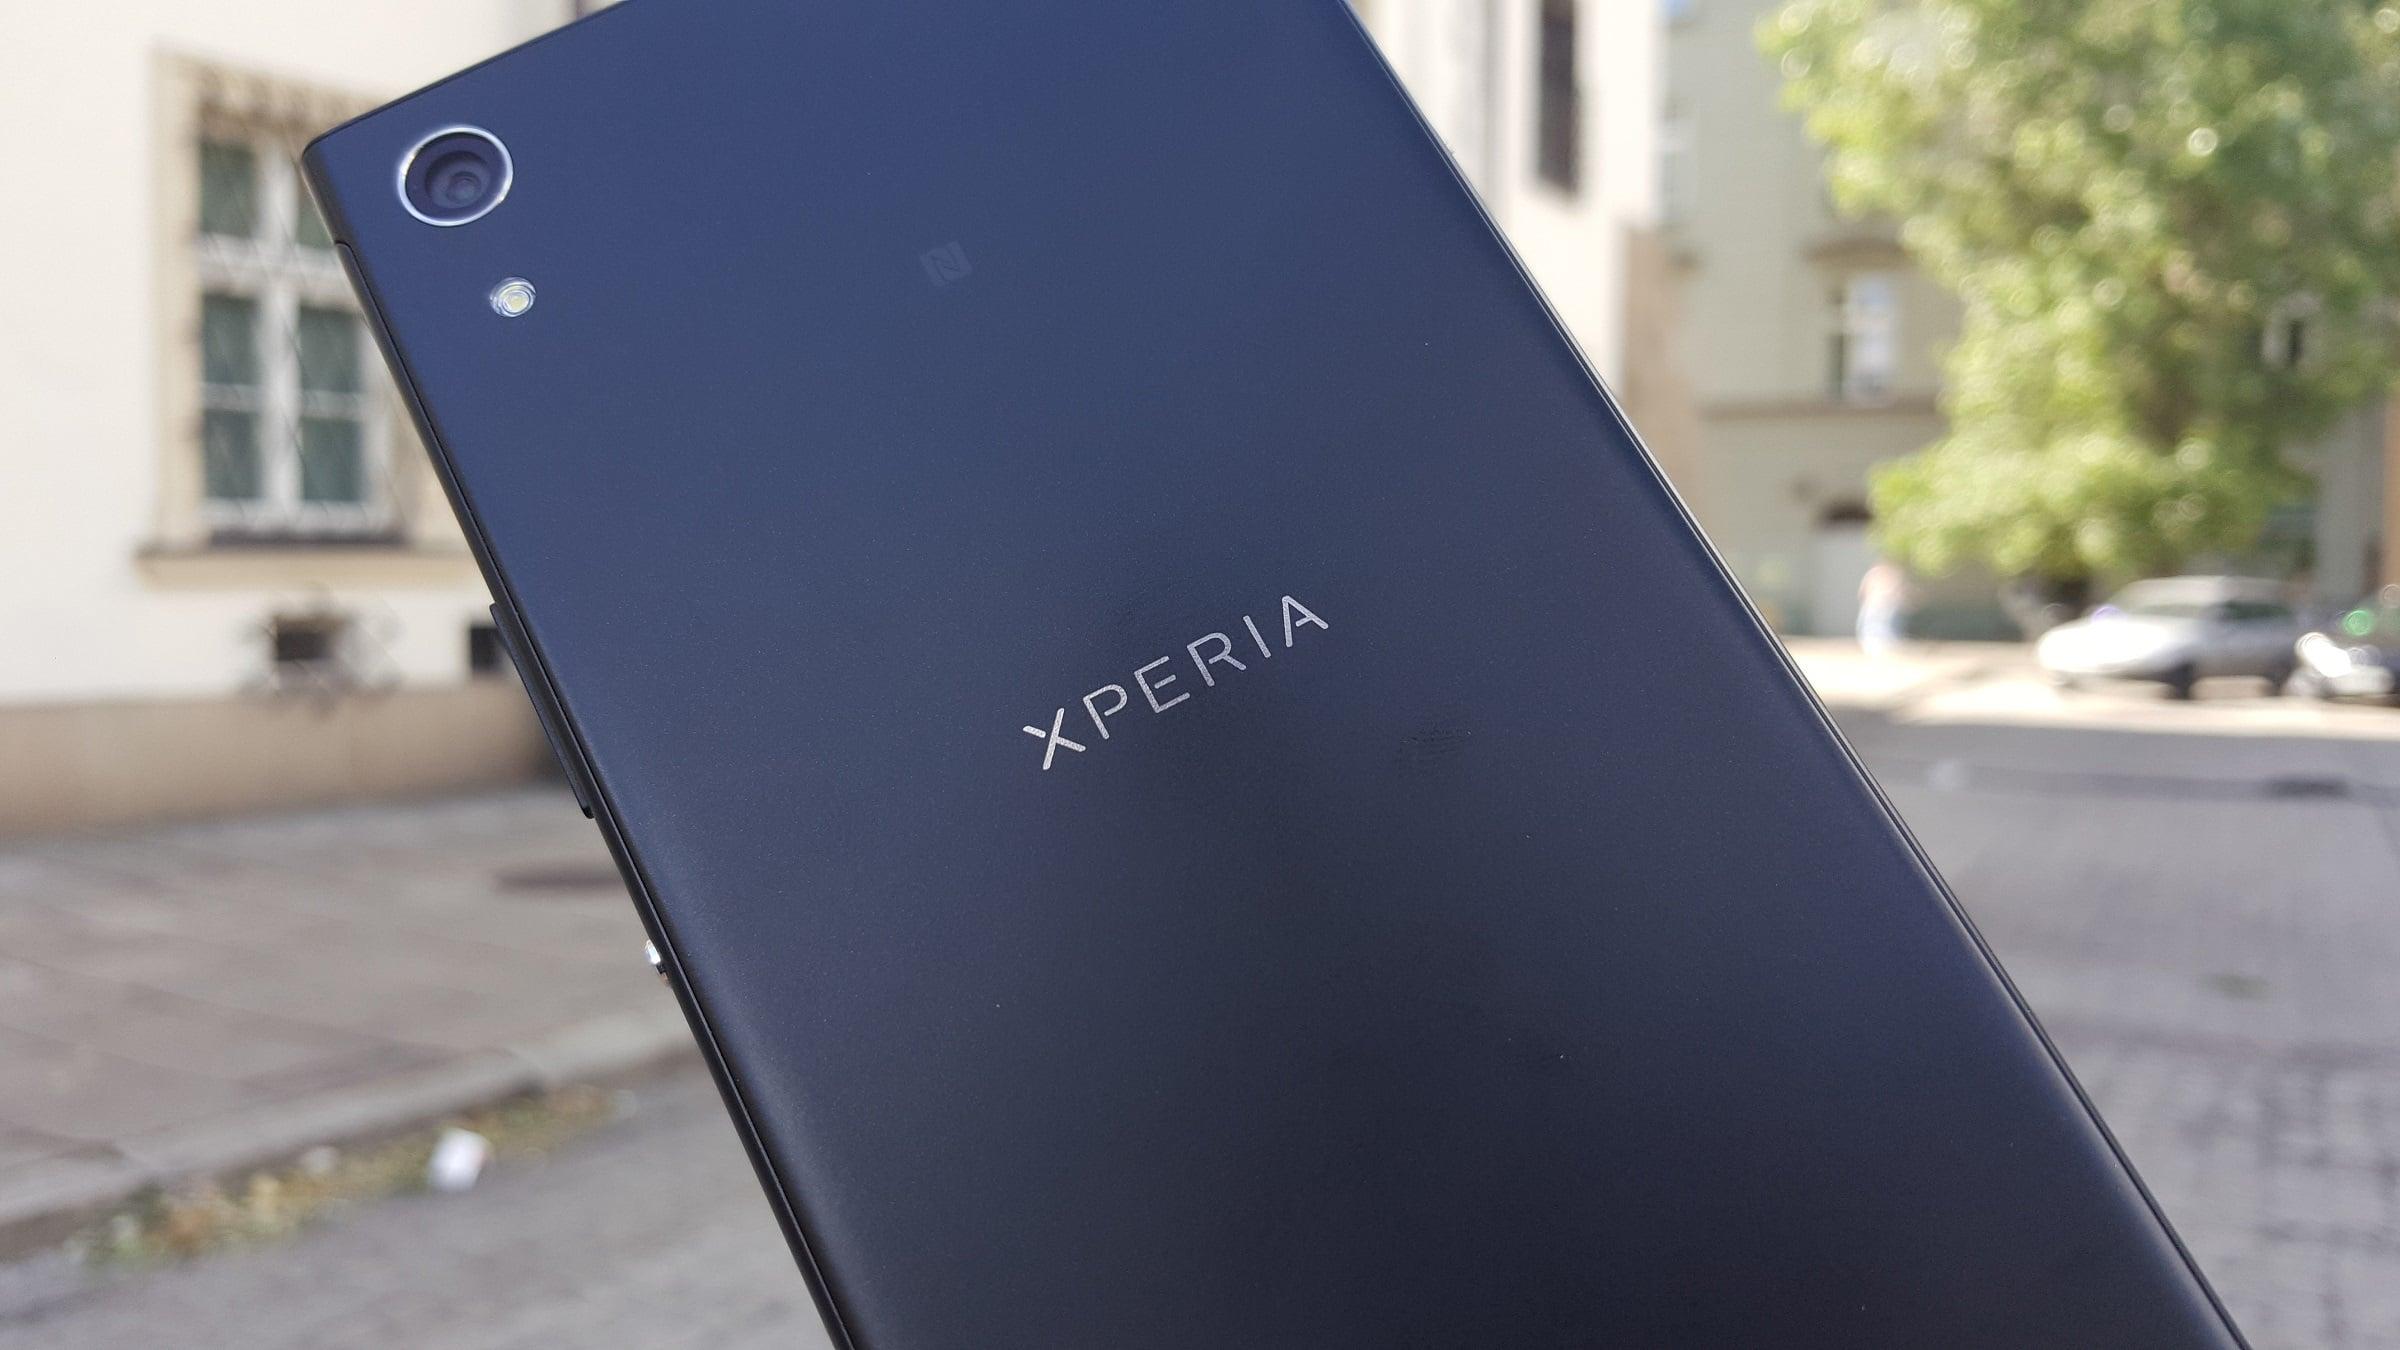 Porównanie parametrów: Sony Xperia XA2, Xperia XA2 Ultra i Xperia L2 vs Xperia XA1, Xperia XA1 Ultra i Xperia L1 28